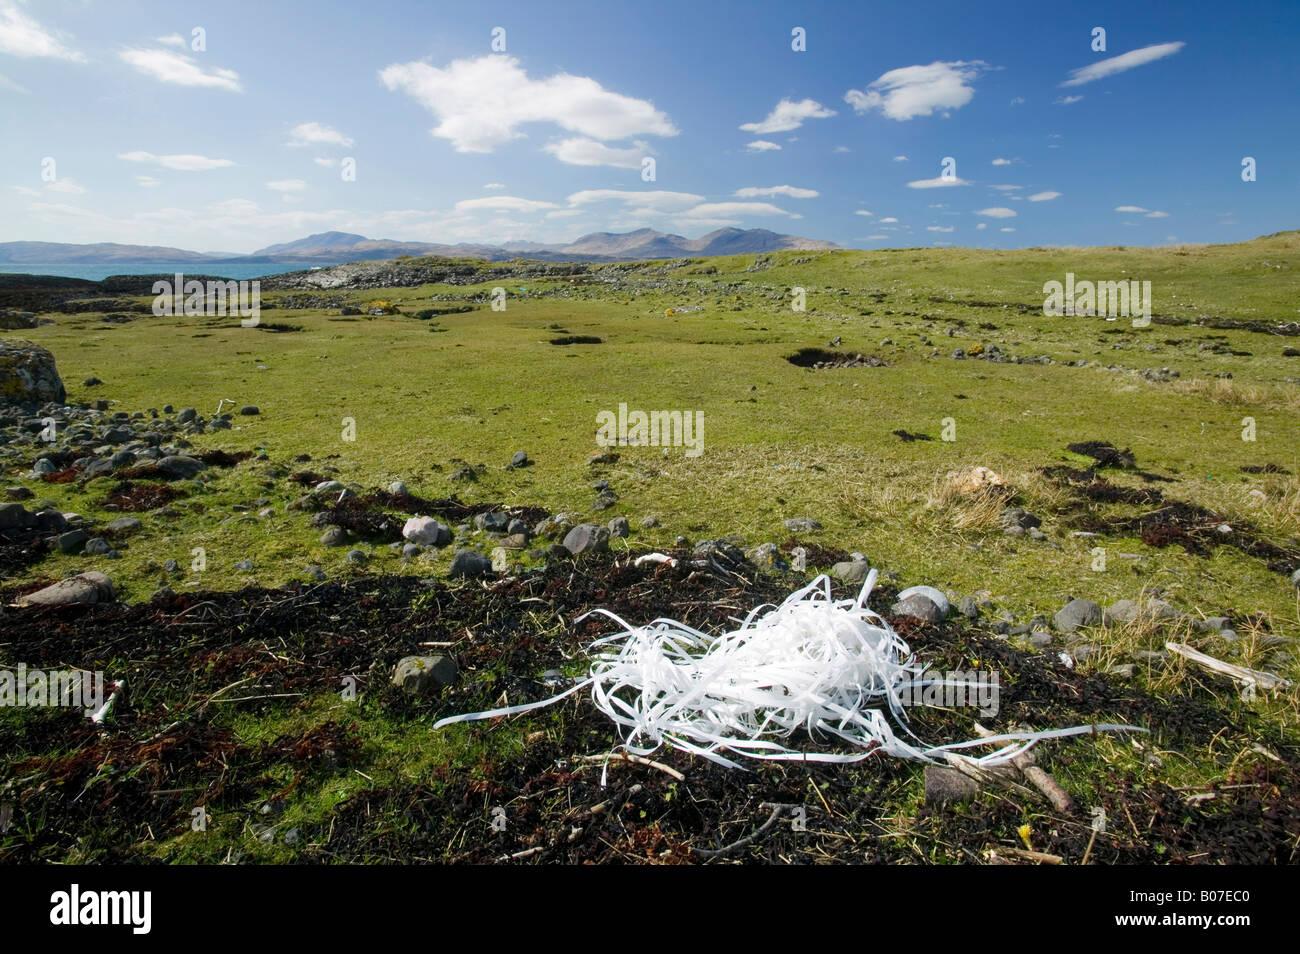 Plastic waste washed ashore and blown inland on the isle of Kerrera off Oban Scotland UK - Stock Image